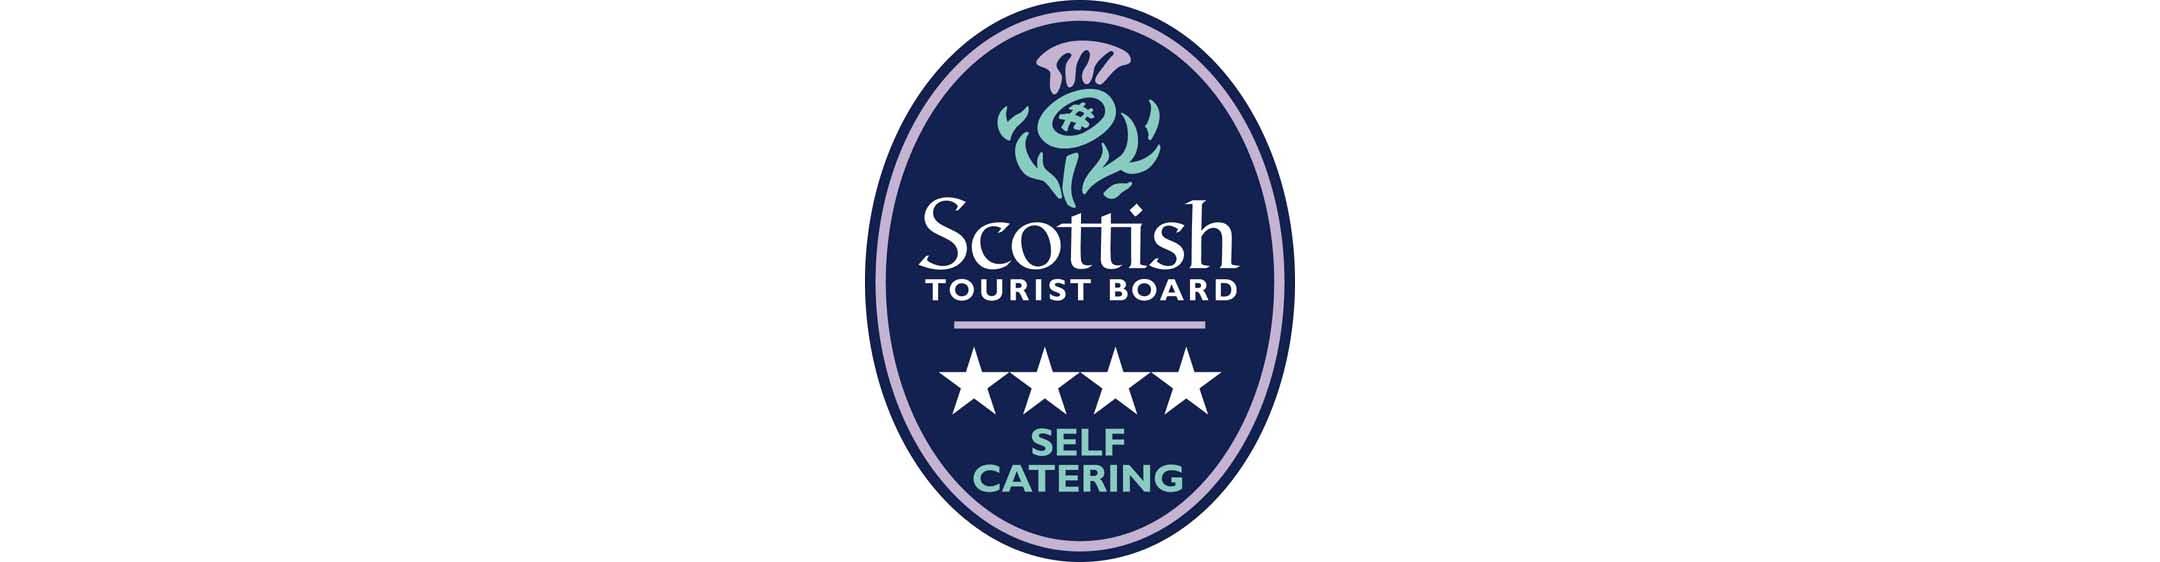 McDonald Residence Edinburgh Visit Scotland 4 star rating